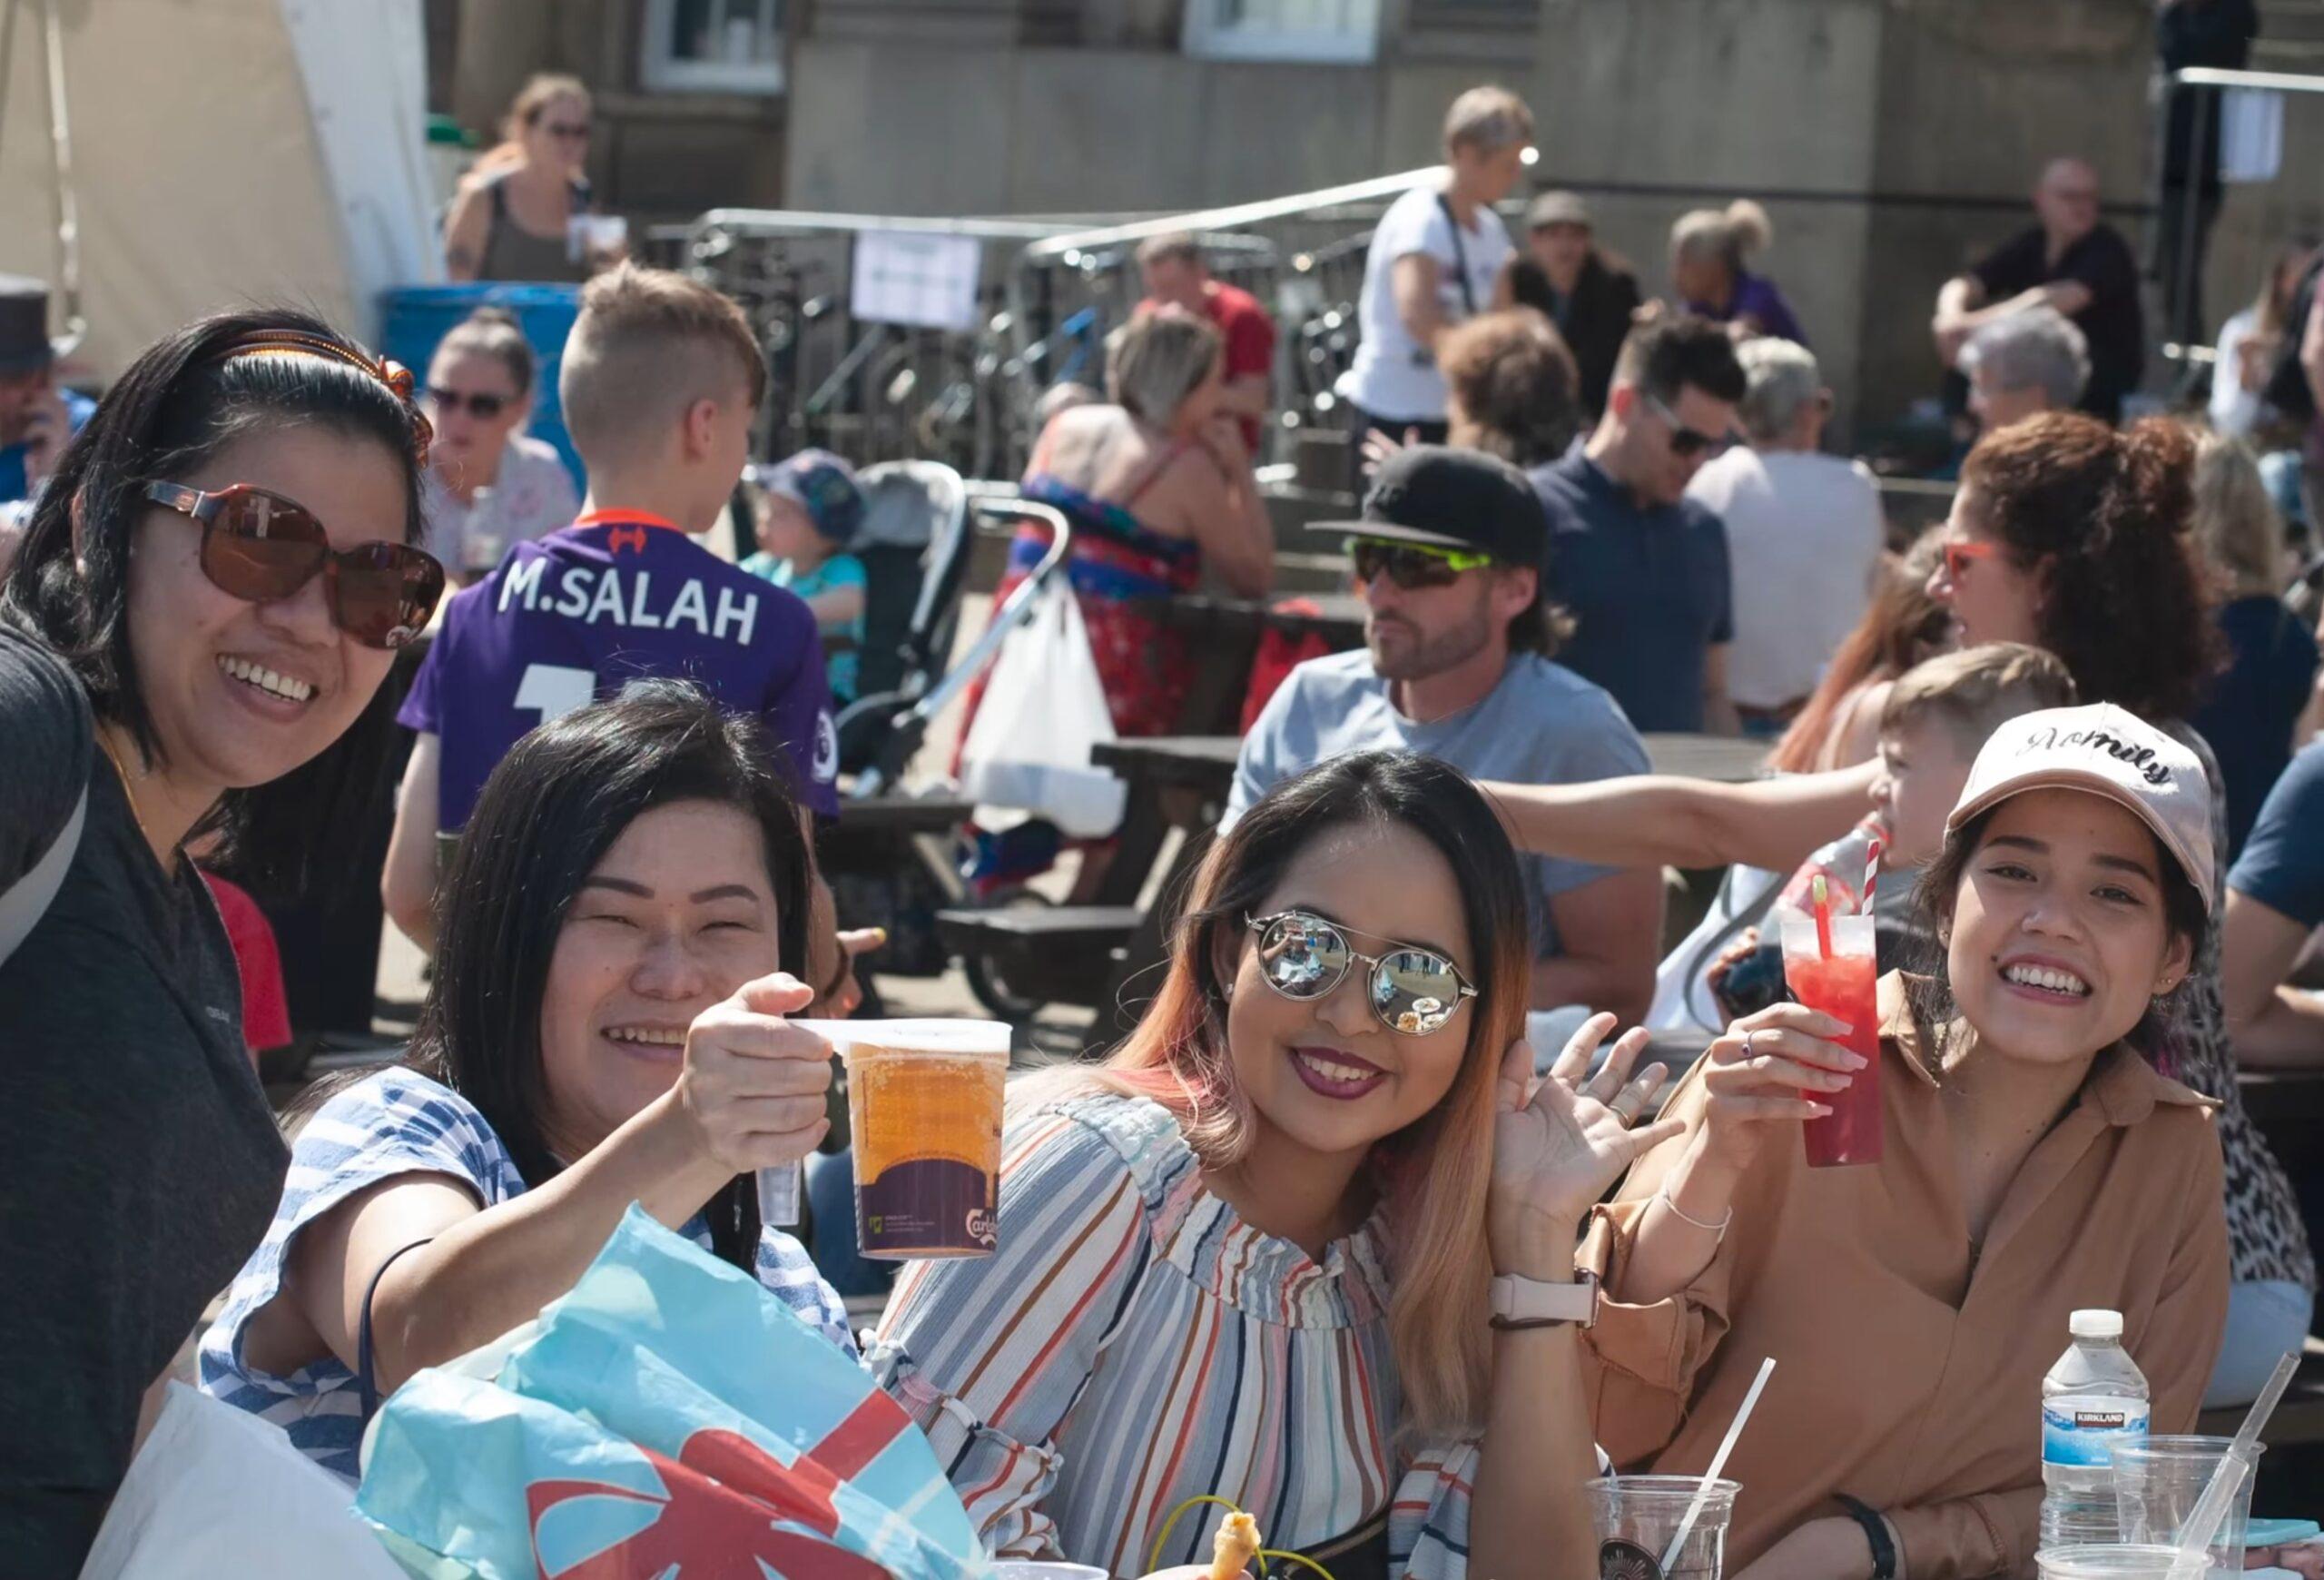 Huddersfield's First 'Virtual' Food & Drink Festival Announced